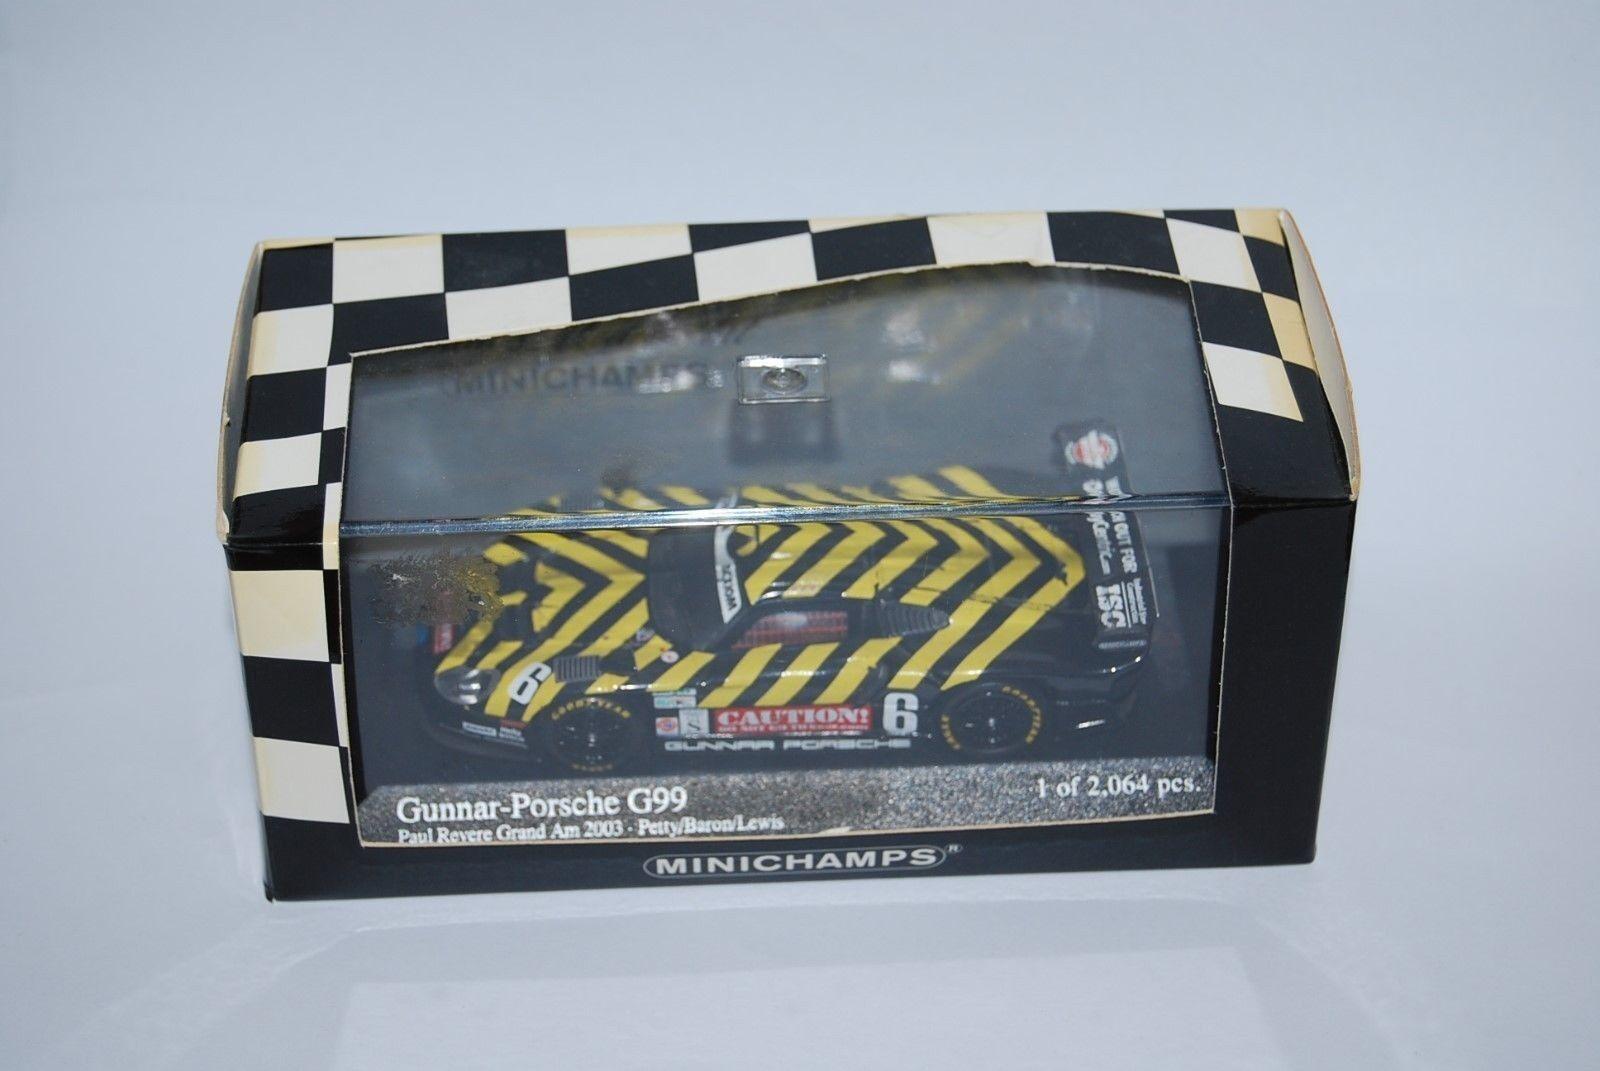 MINICHAMPS PORSCHE 911 G99 DE 2003 4009966886 NEUF BOITE NEW BOX 1 43 TRES RARE